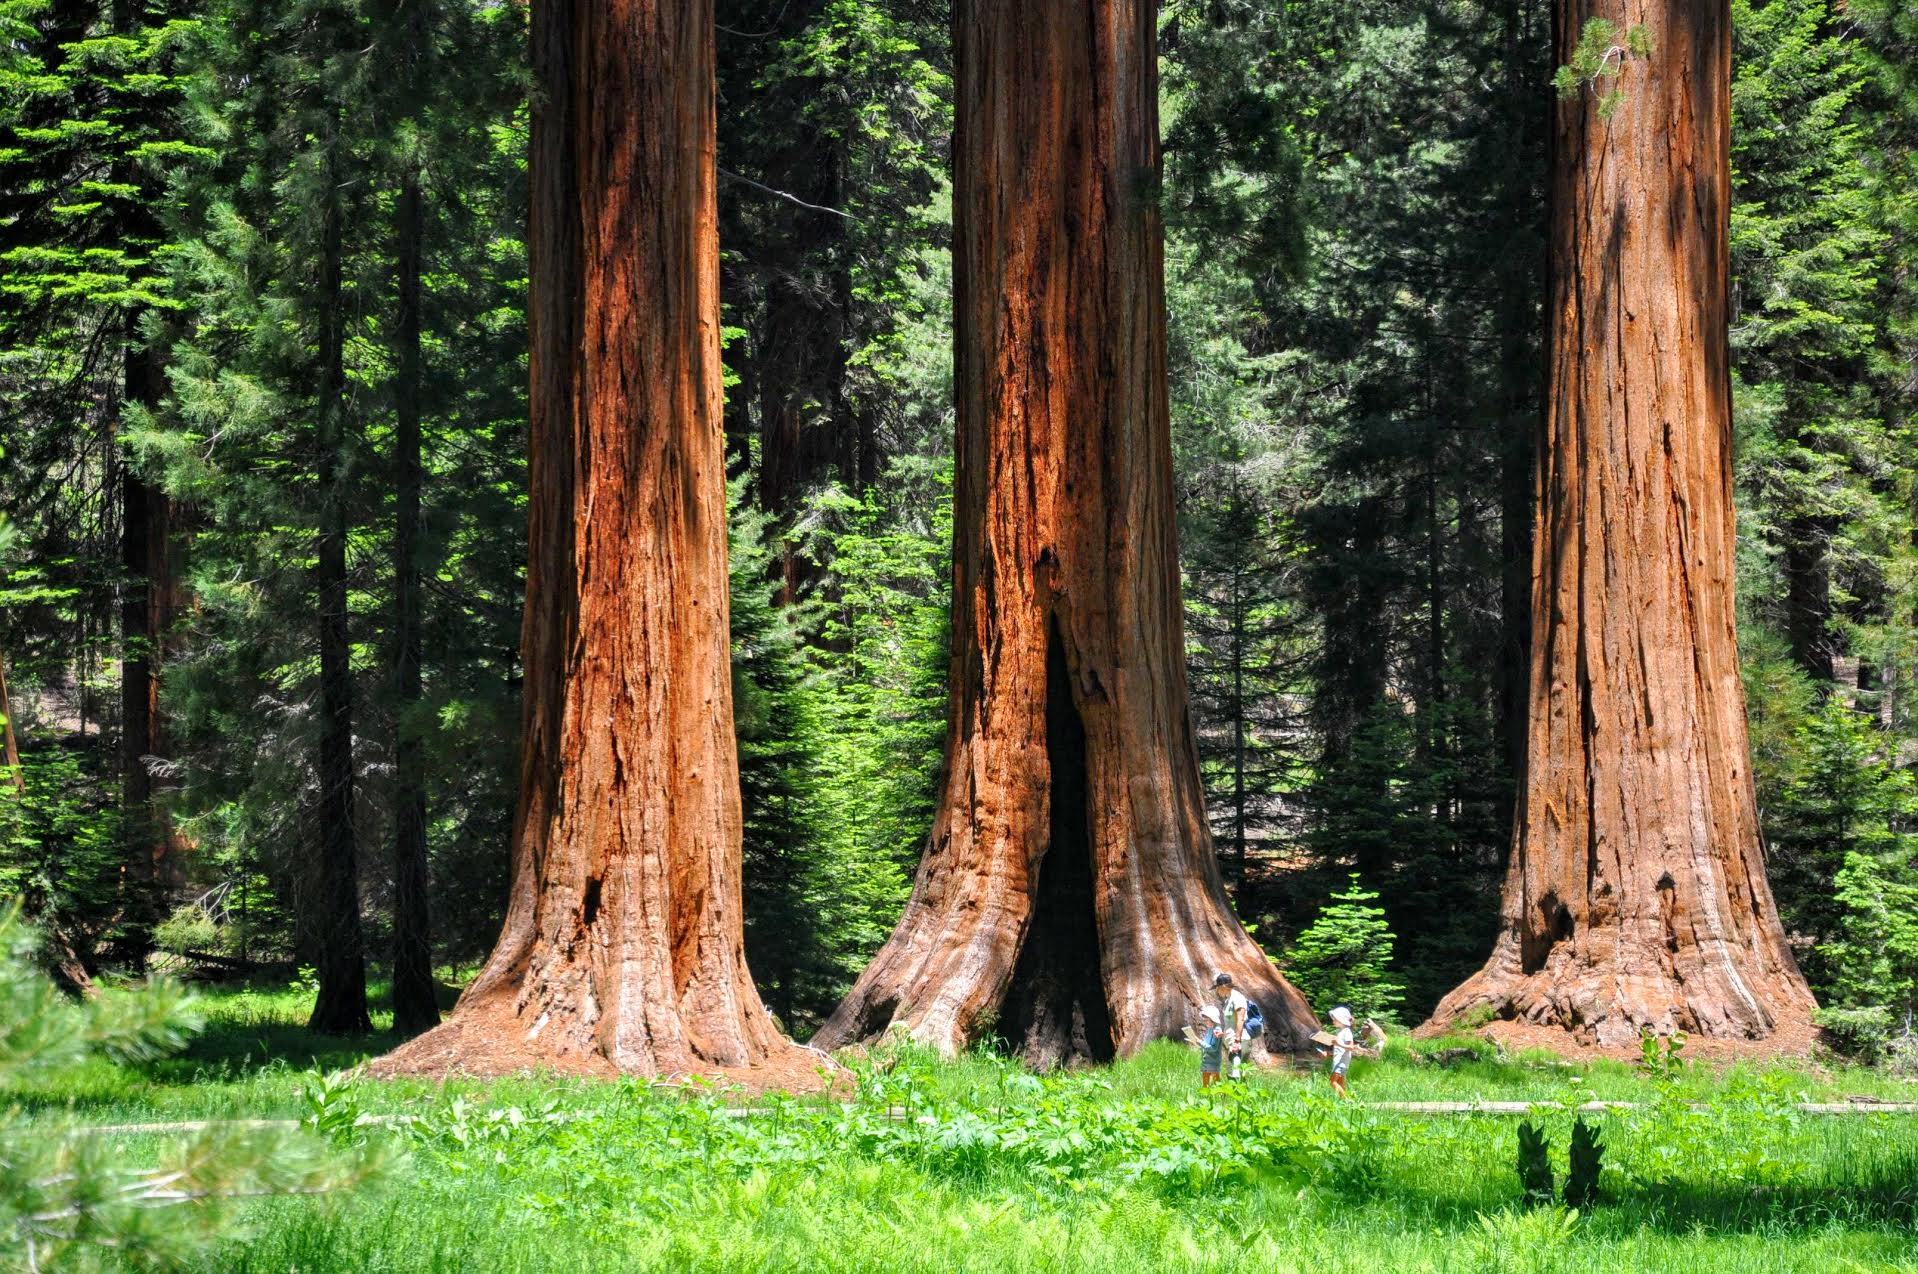 Photo Credit: Buckeye Tree Lodge